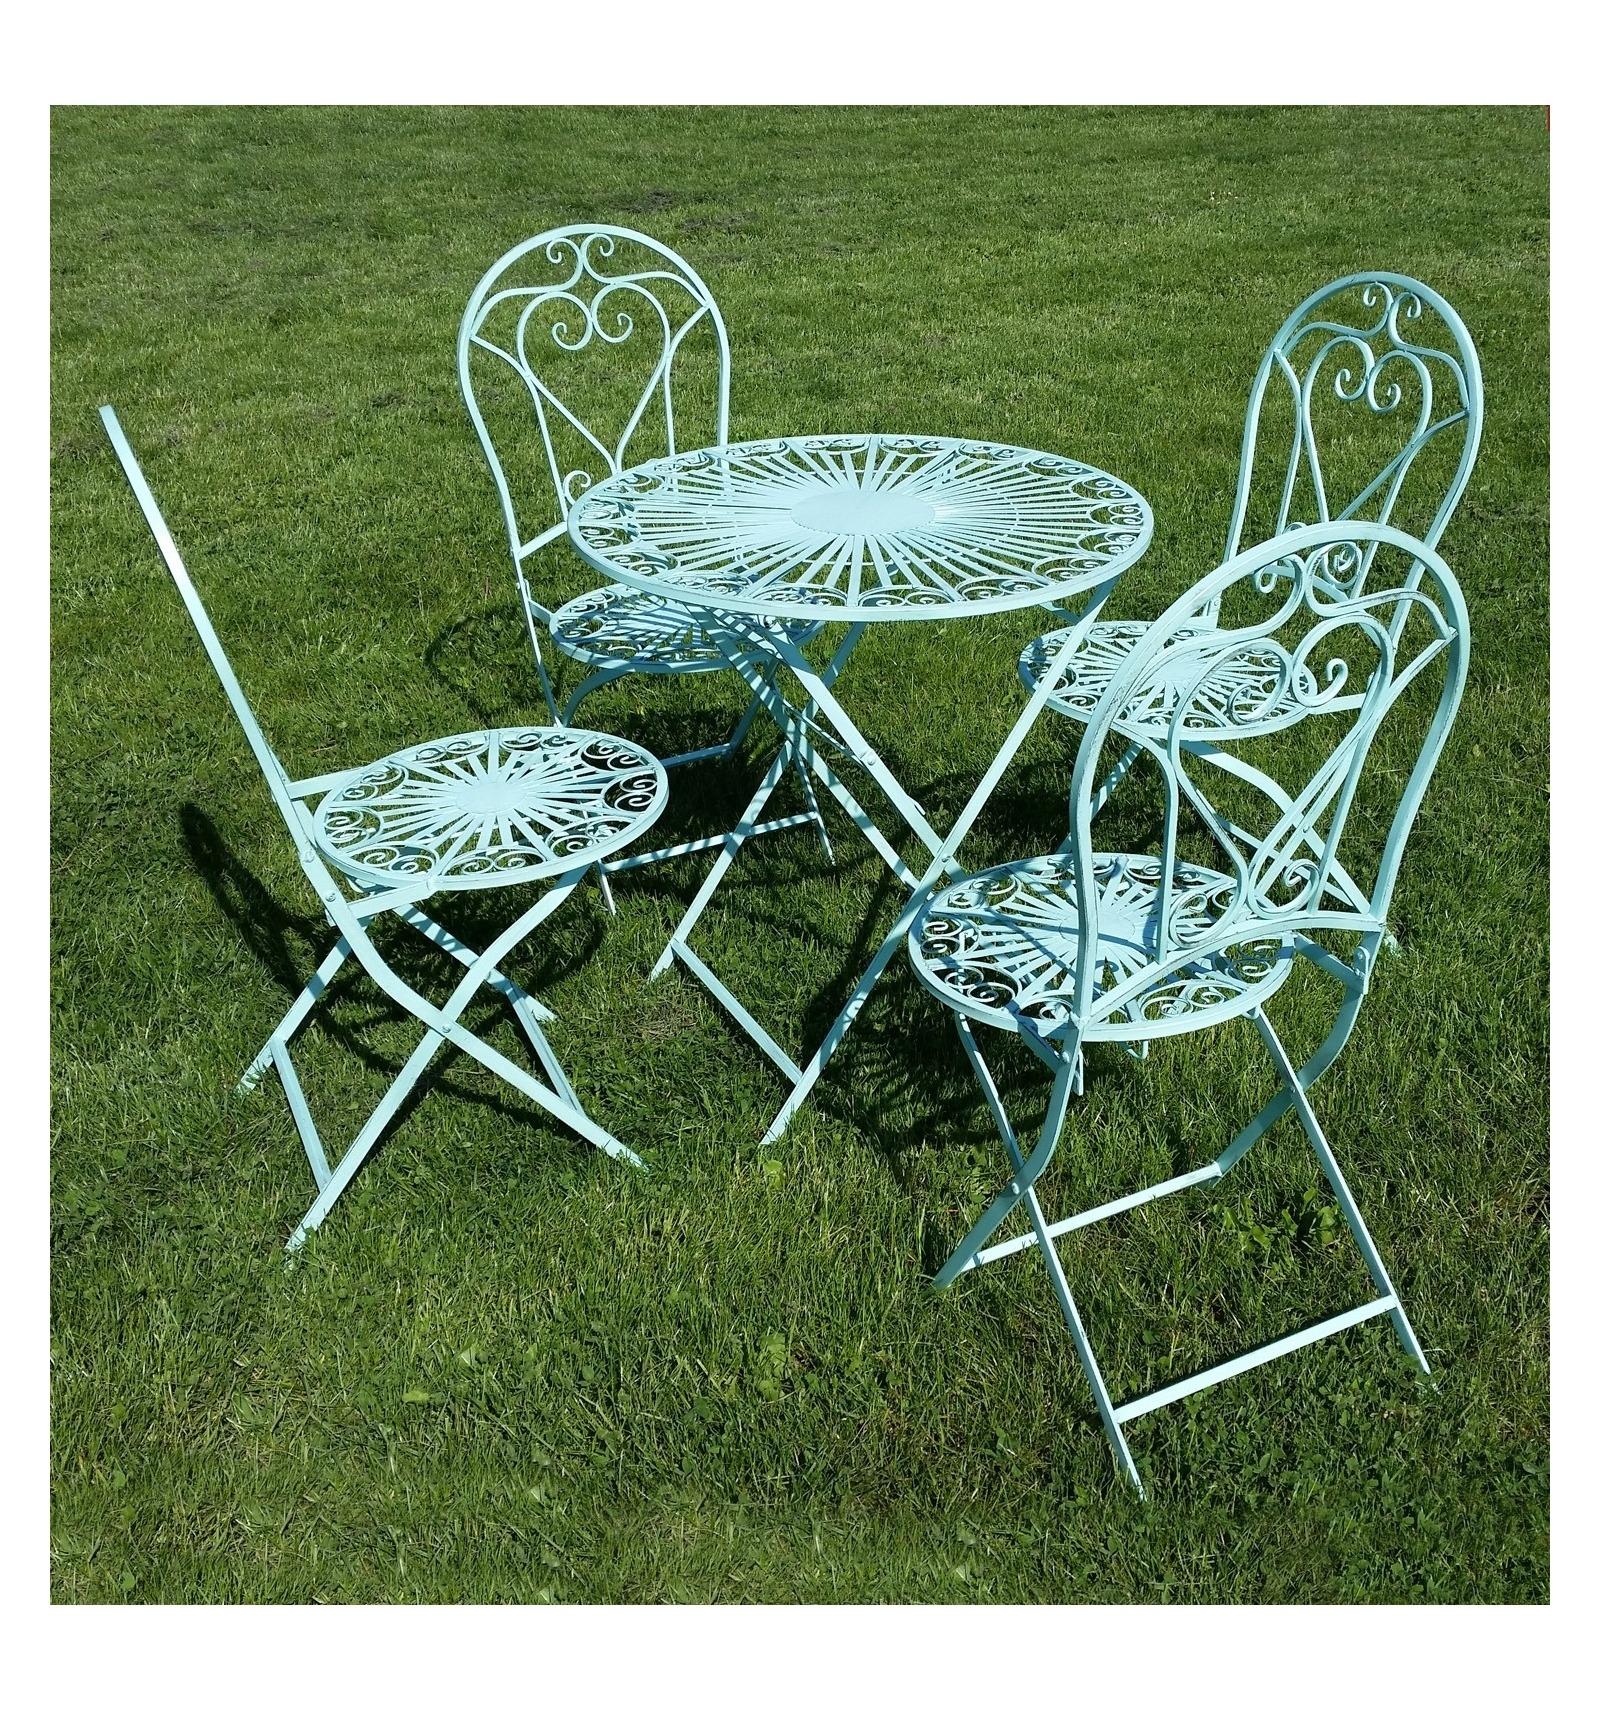 Mobili Da Giardino Trovaprezzi.Sedie In Ferro Battuto Da Giardino Prezzi Beautiful Sedie